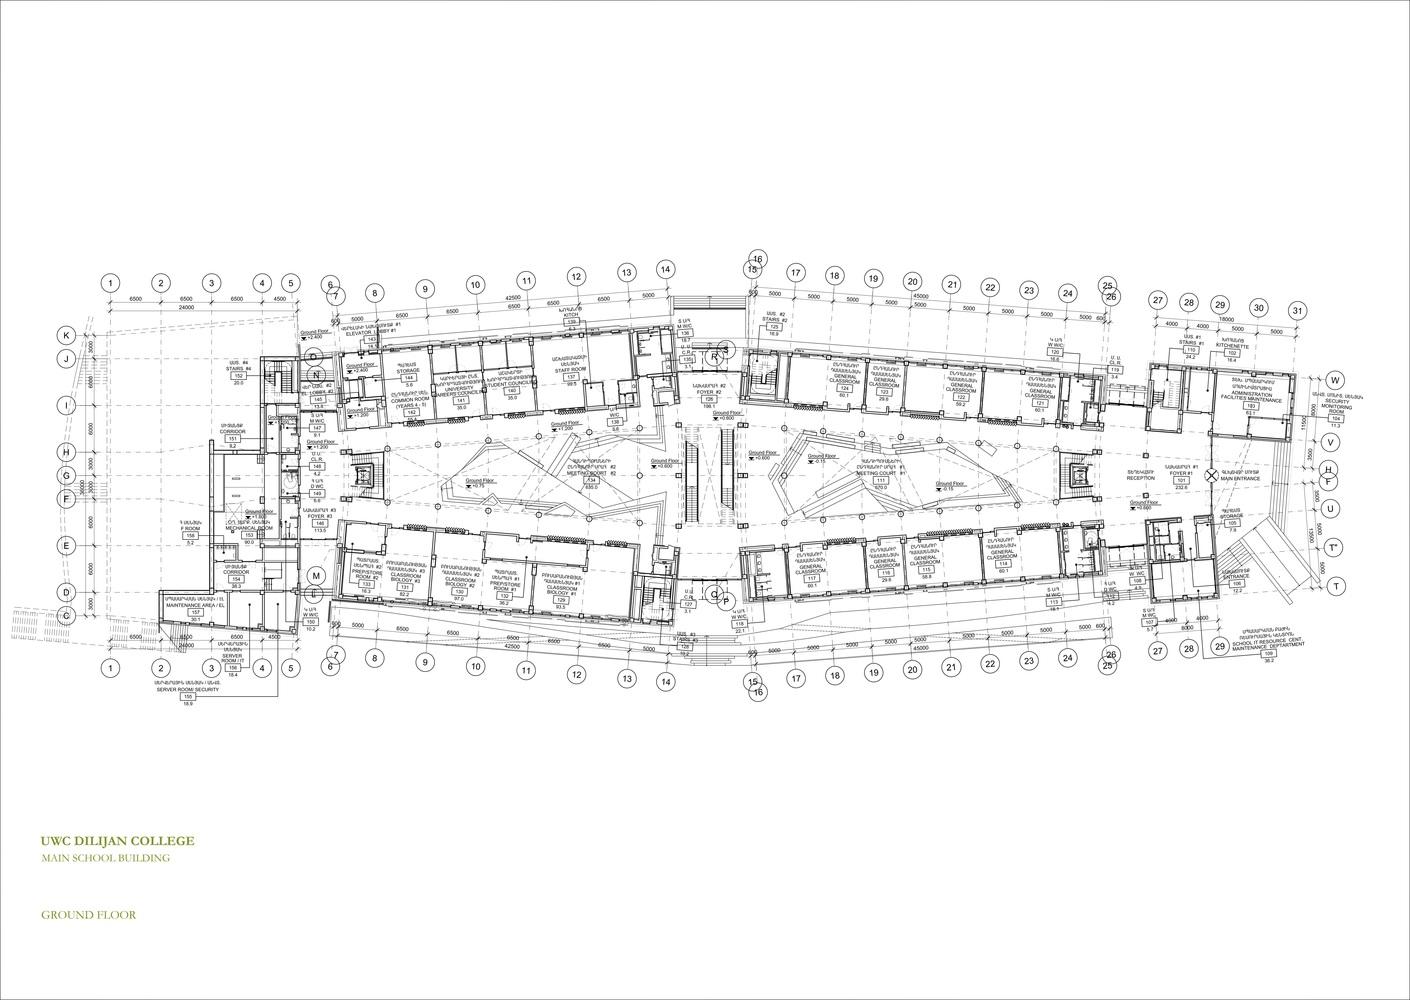 small resolution of uwc dilijan college ground floor plan